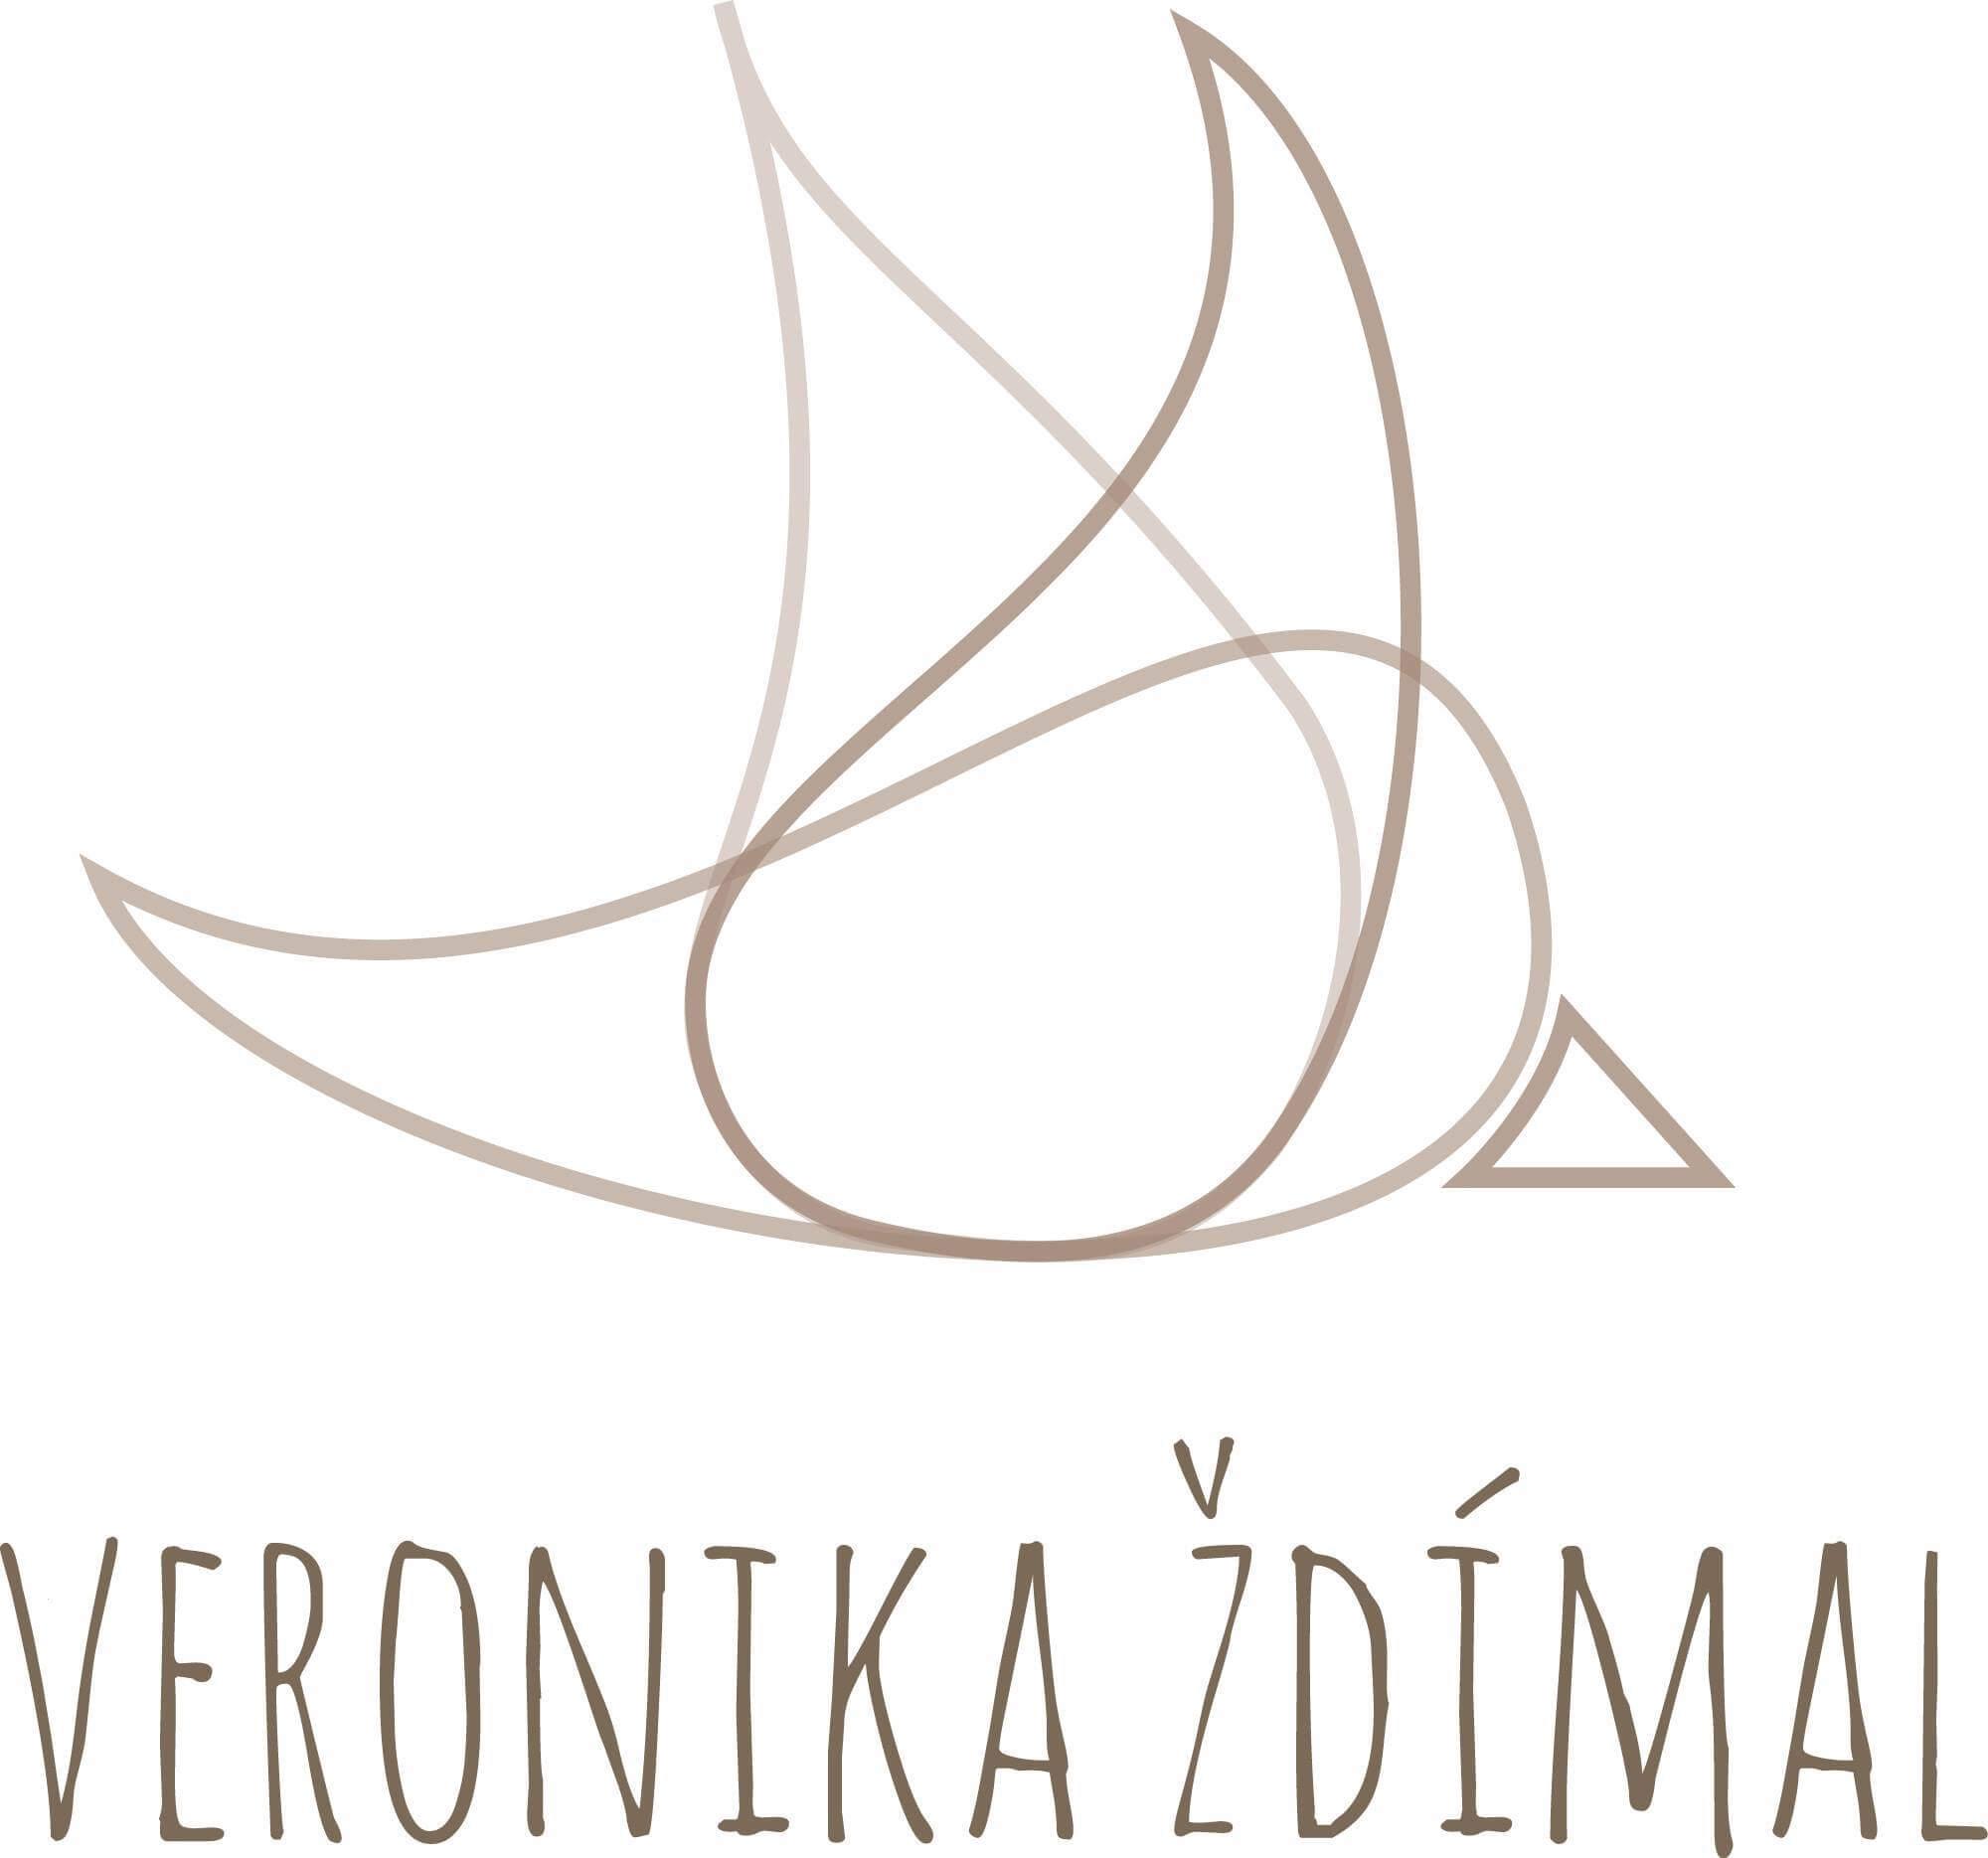 veronika-zdimal-logo